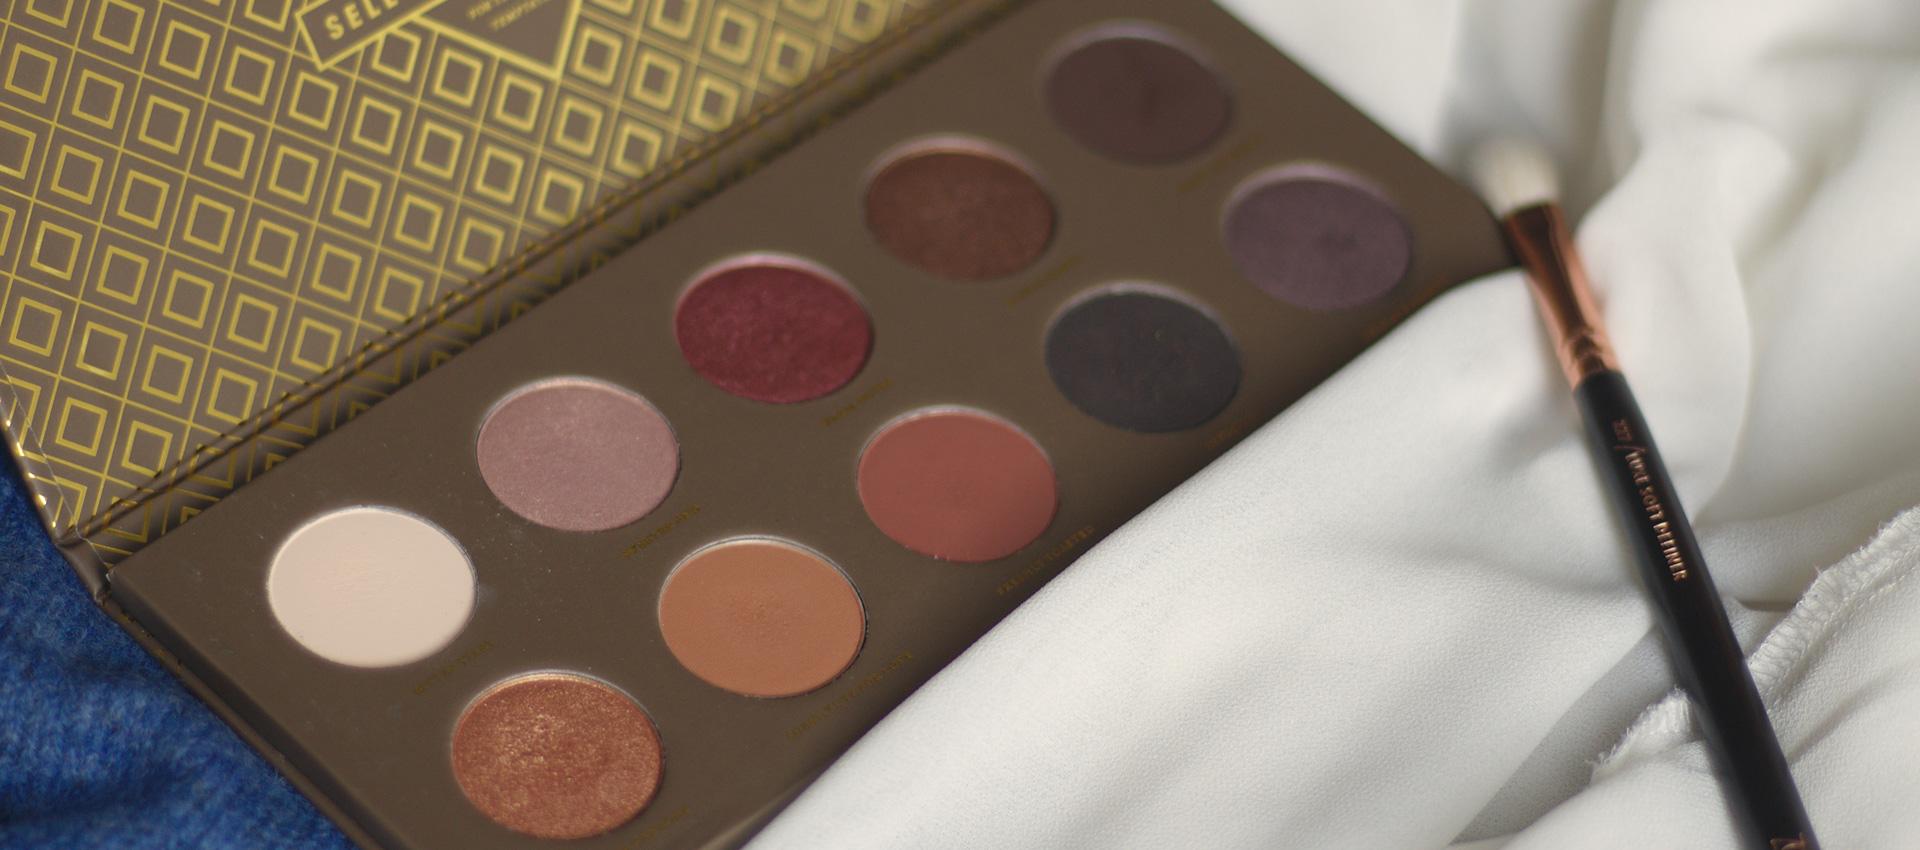 Eine Palette 3 Looks: Zoeva Cocoa Blend